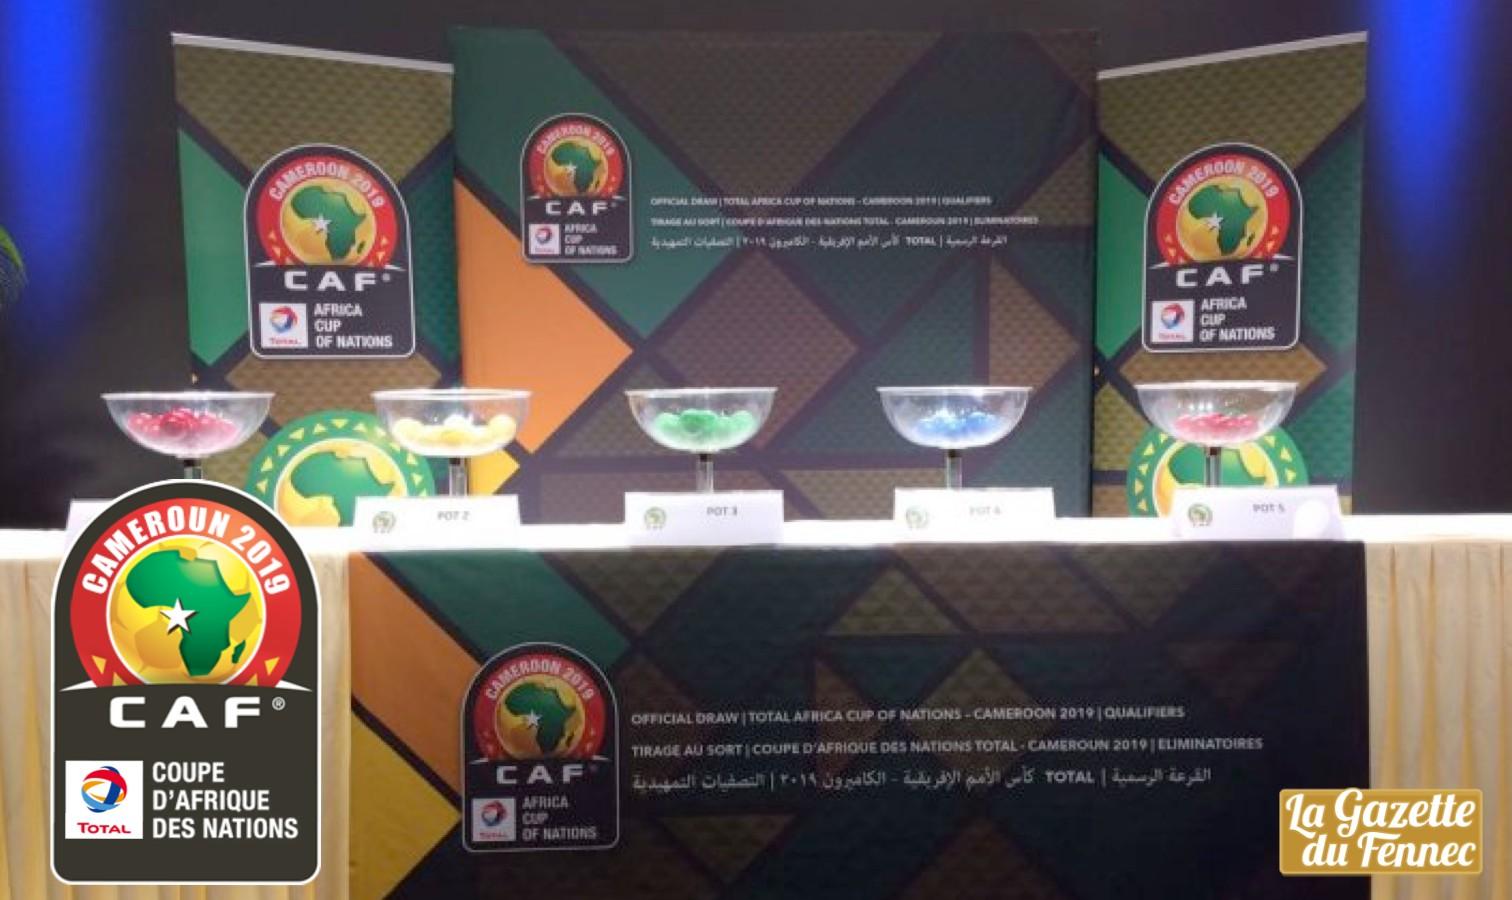 Calendrier De La Caf 2020.Qualifications Can 2019 Le Calendrier Complet Des Verts